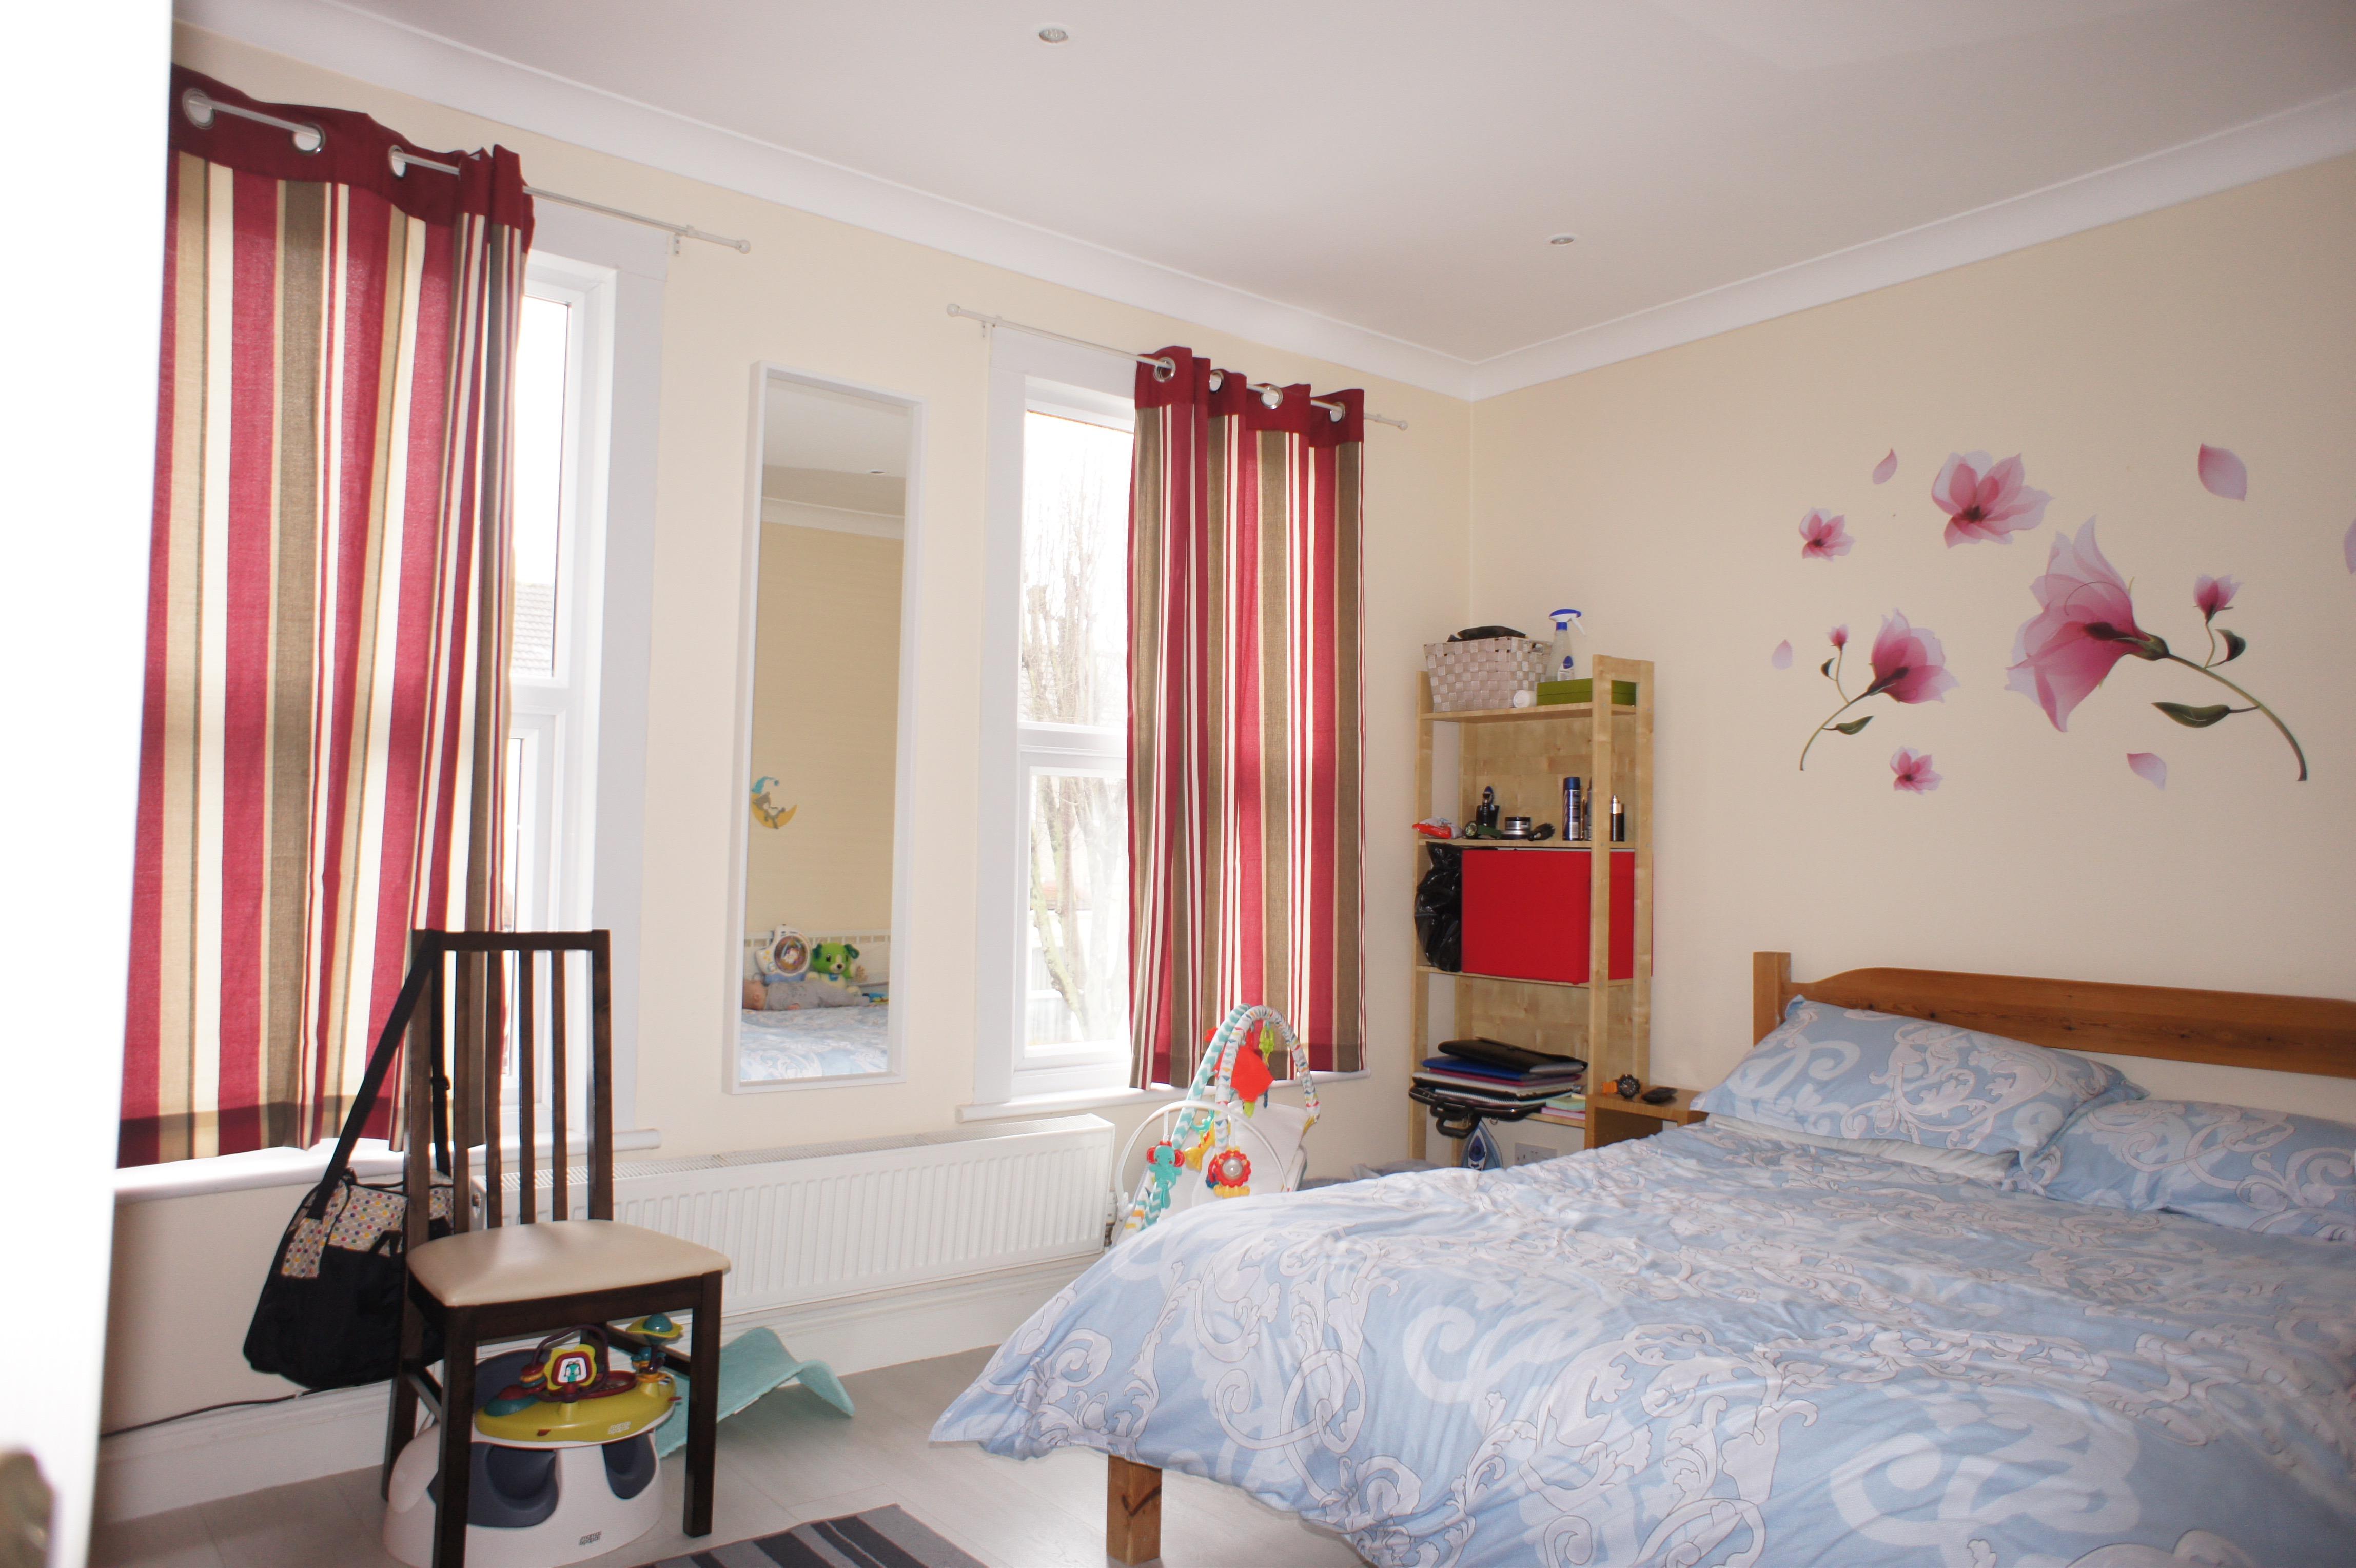 Bed House For Sale Edmonton London